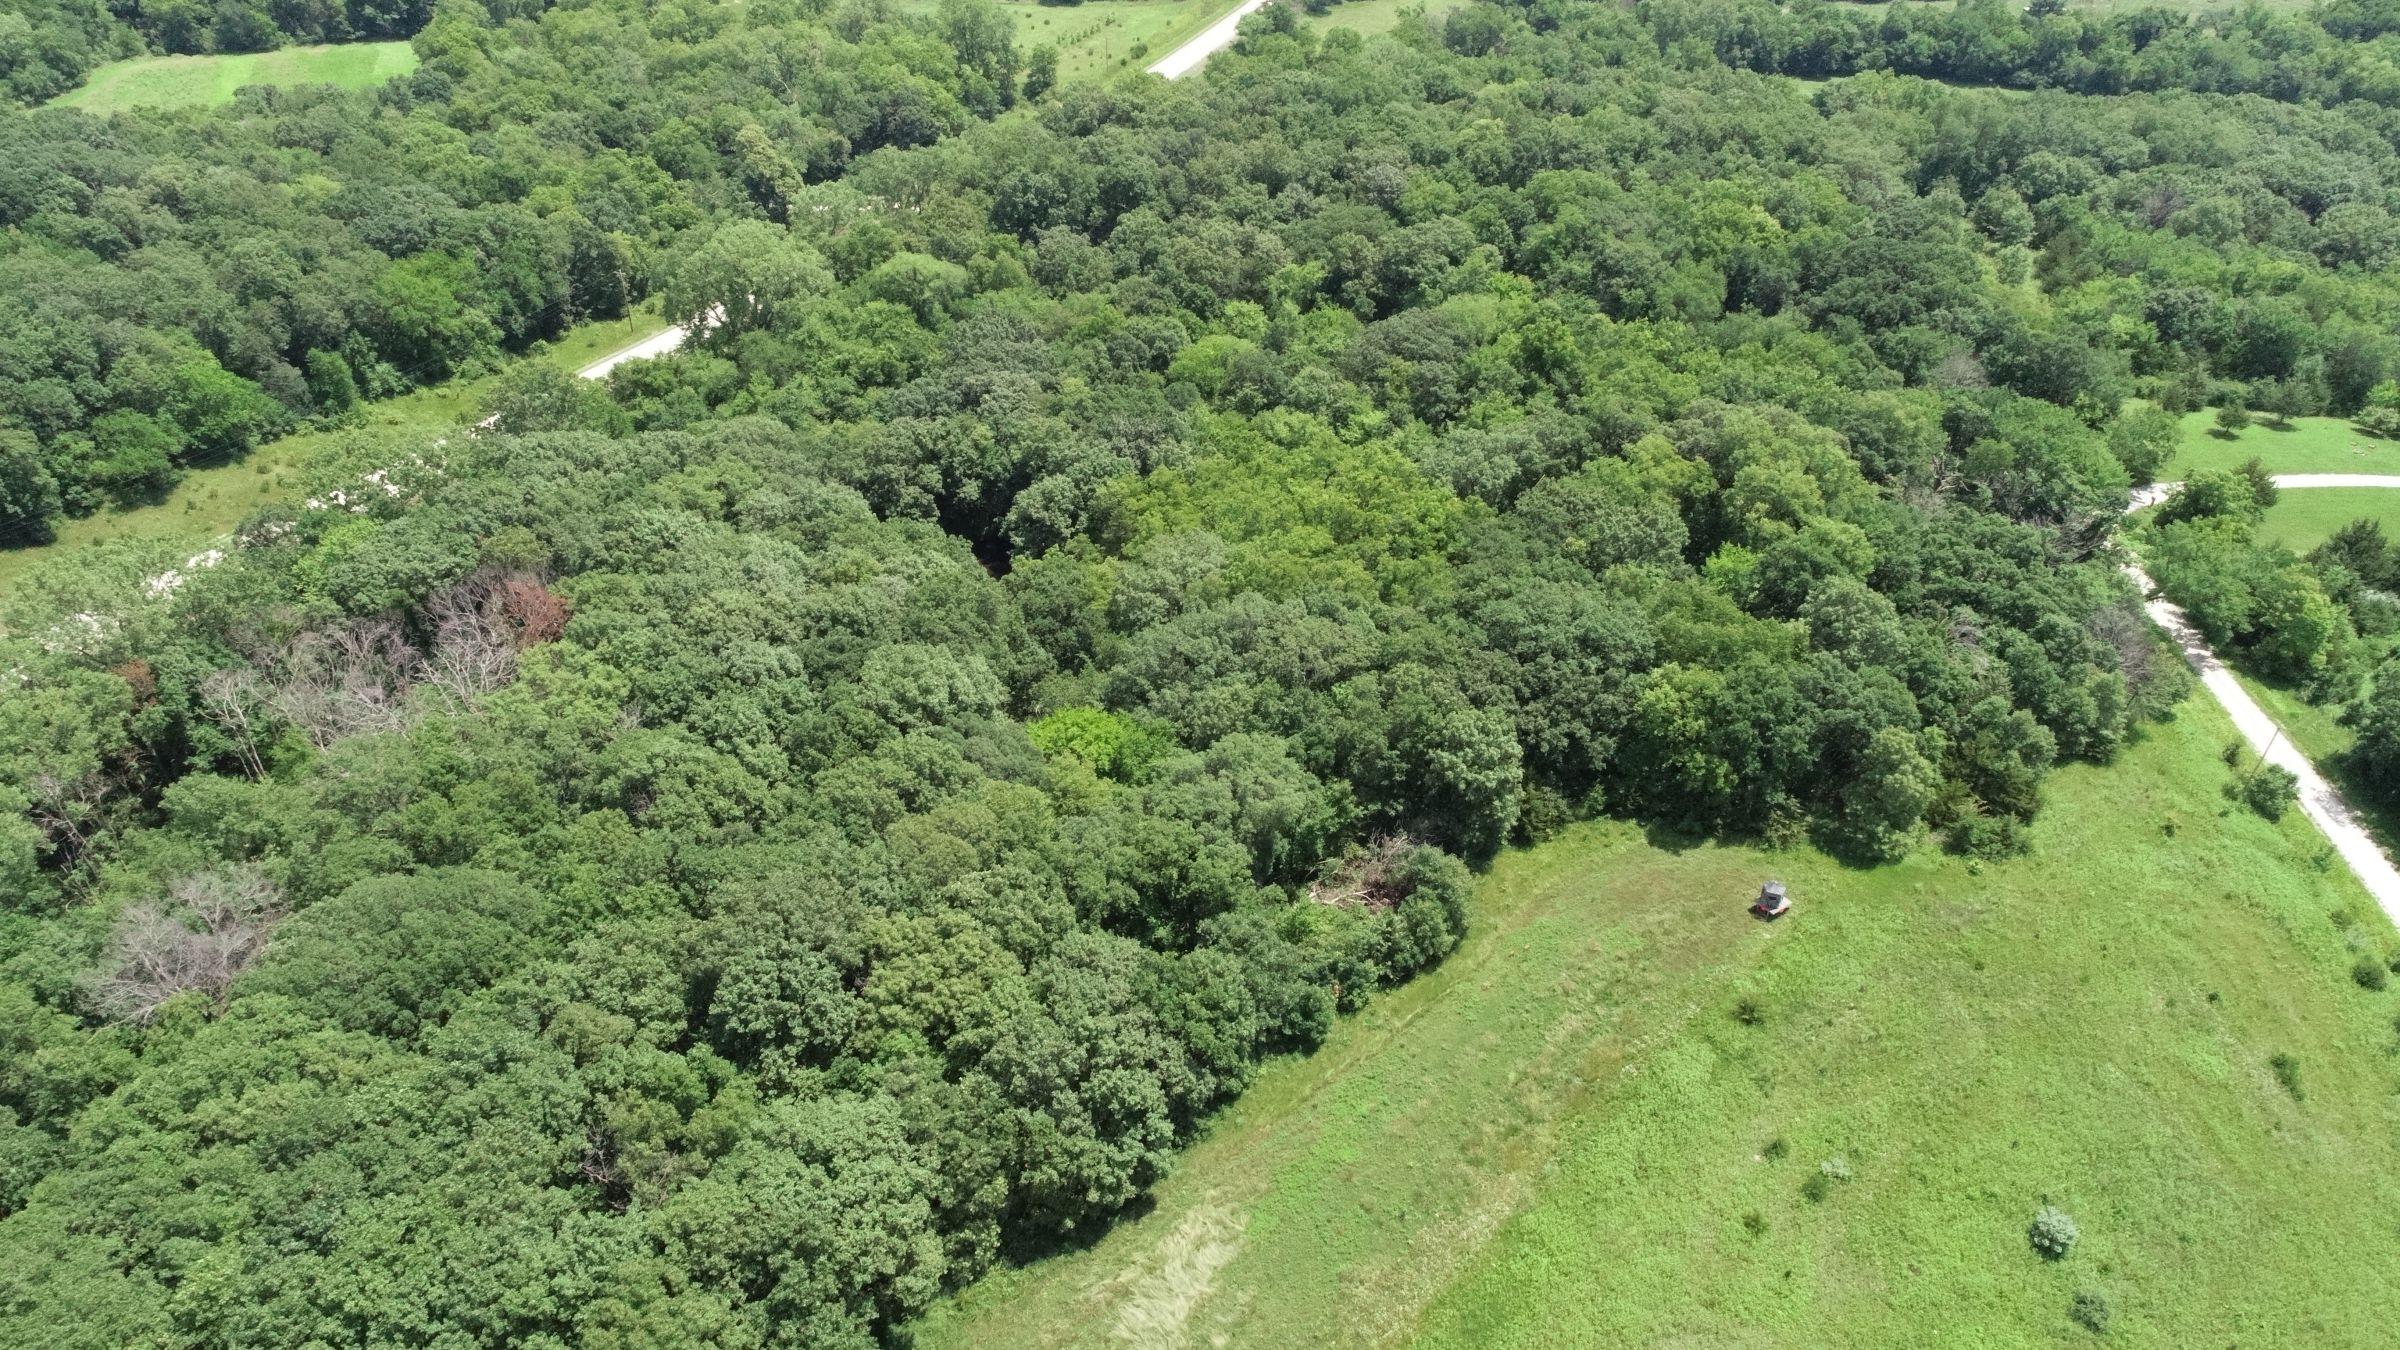 land-warren-county-iowa-29-acres-listing-number-15622-4-2021-07-02-190409.JPG